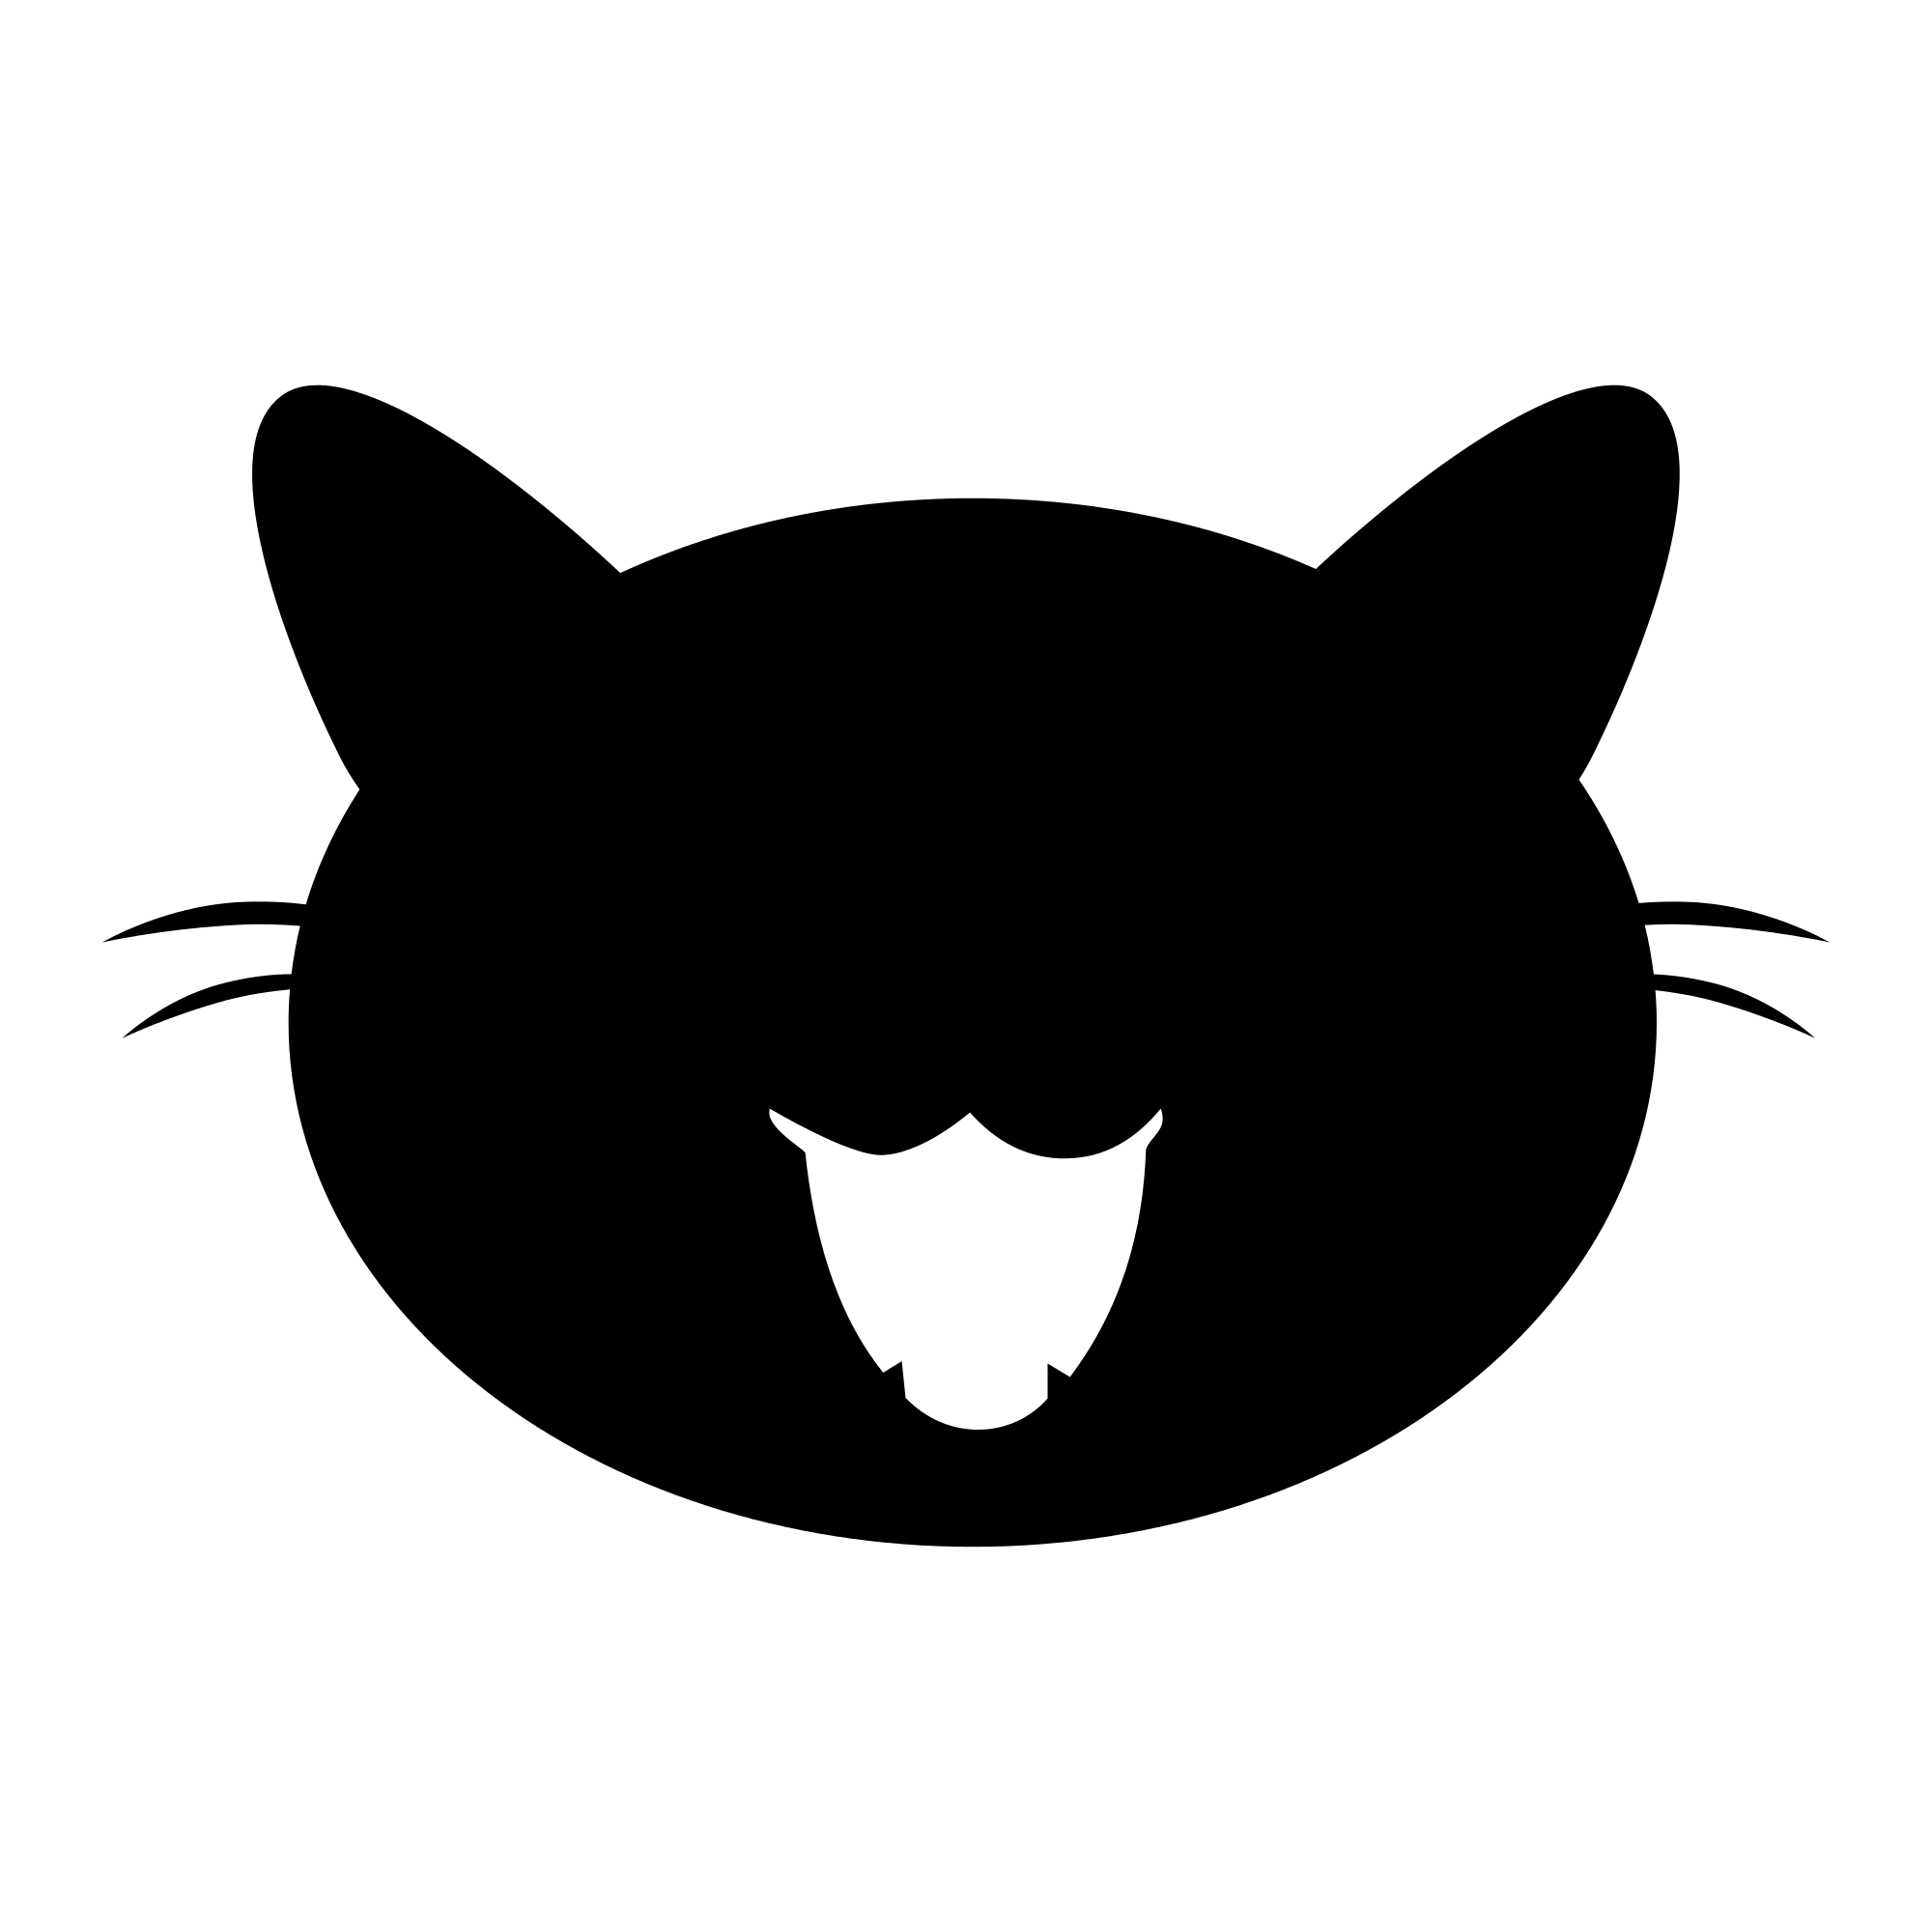 Ama Black Vector PNG - 107794